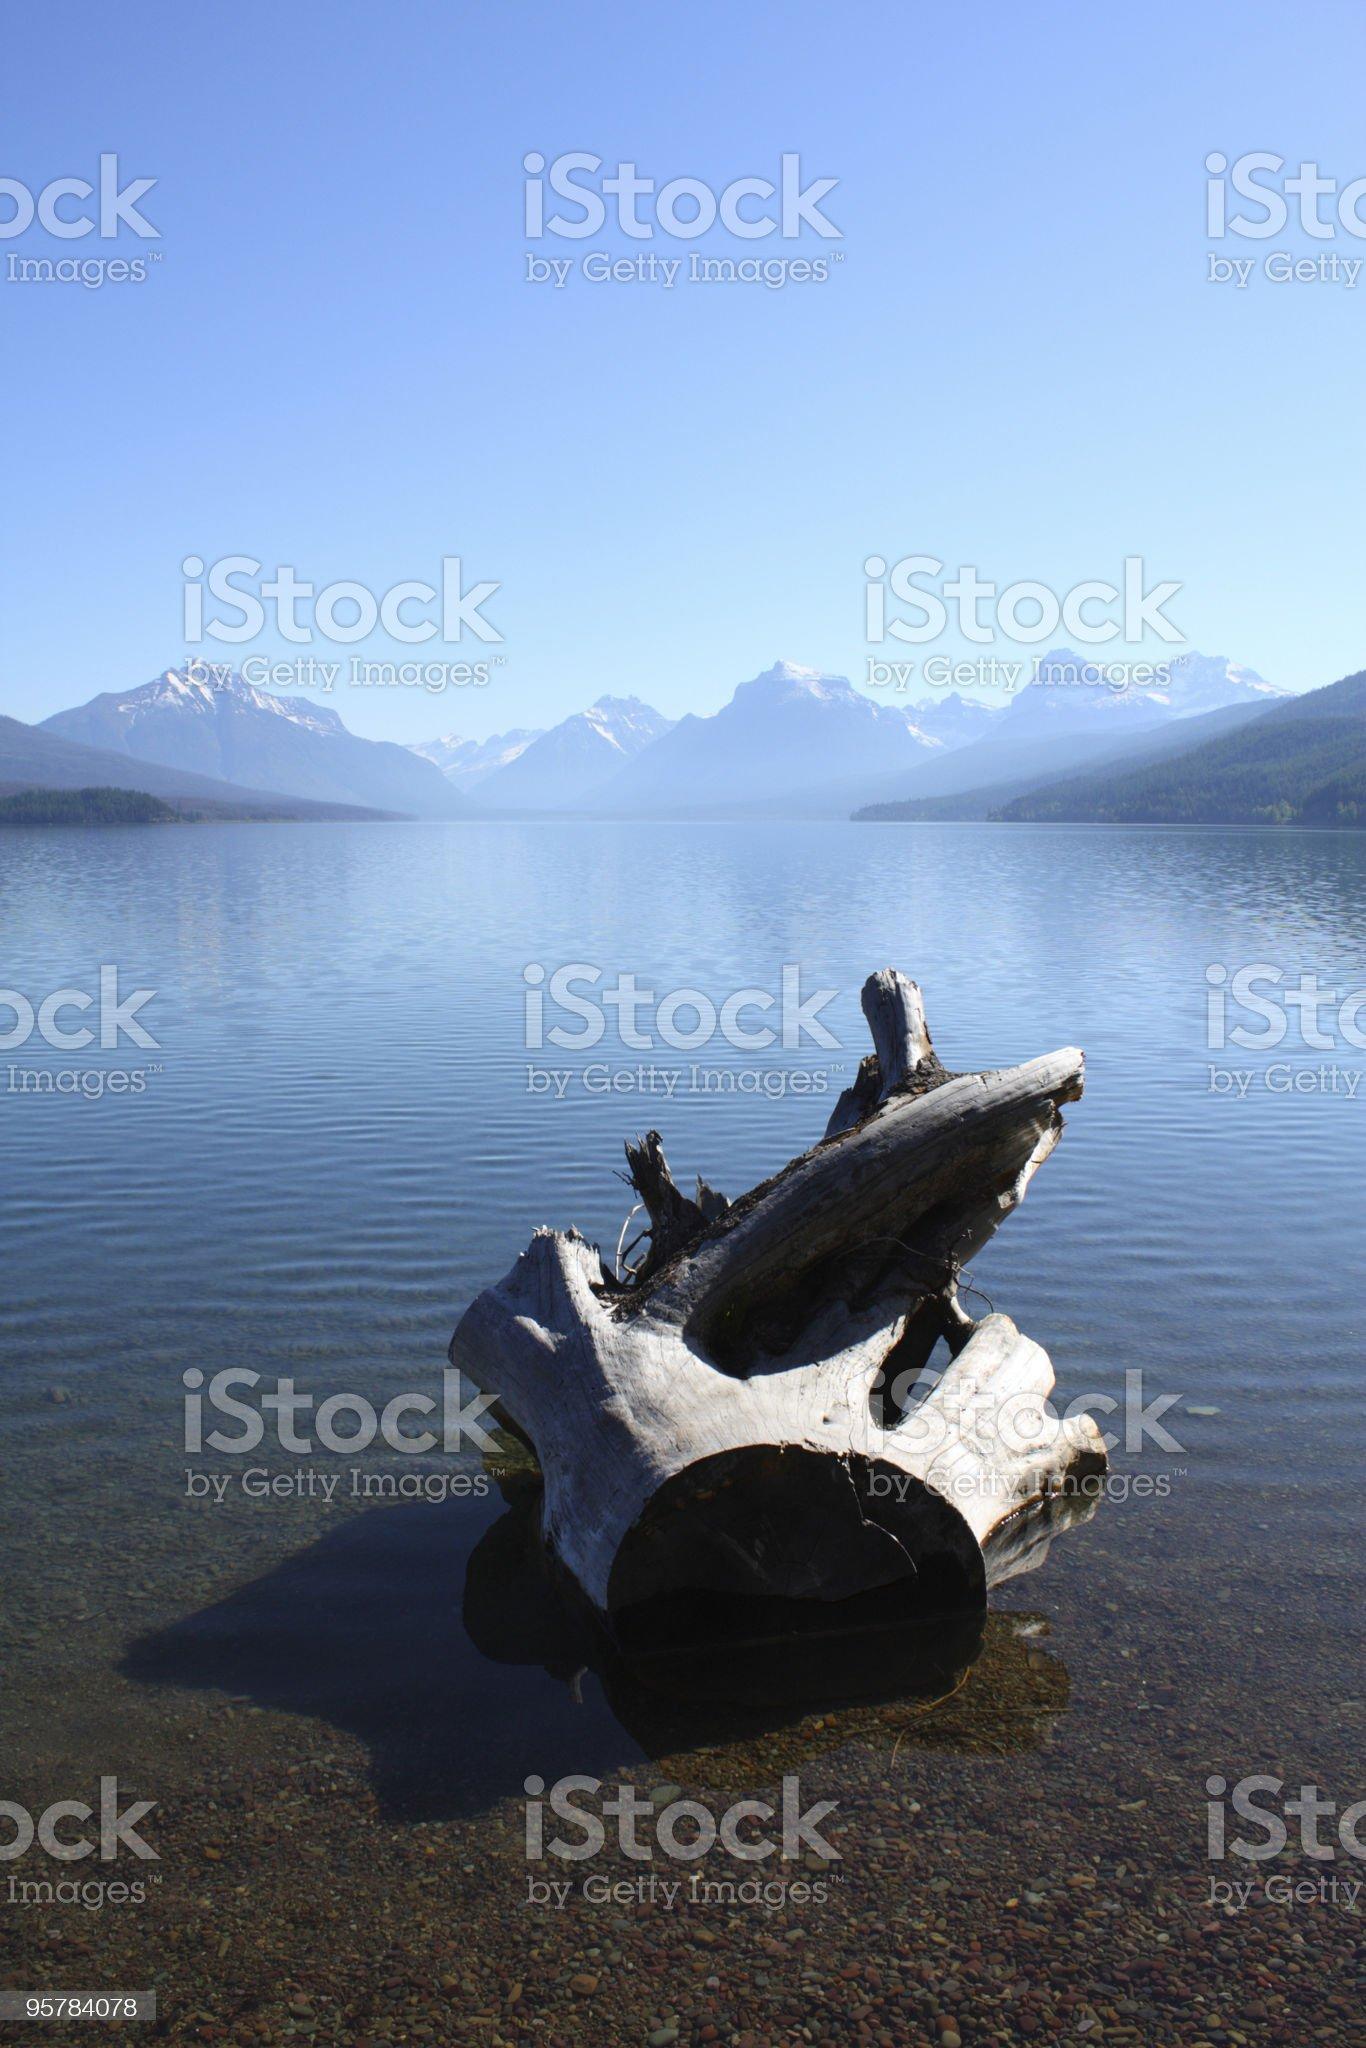 Tree Stump in Water at Mountain lake royalty-free stock photo